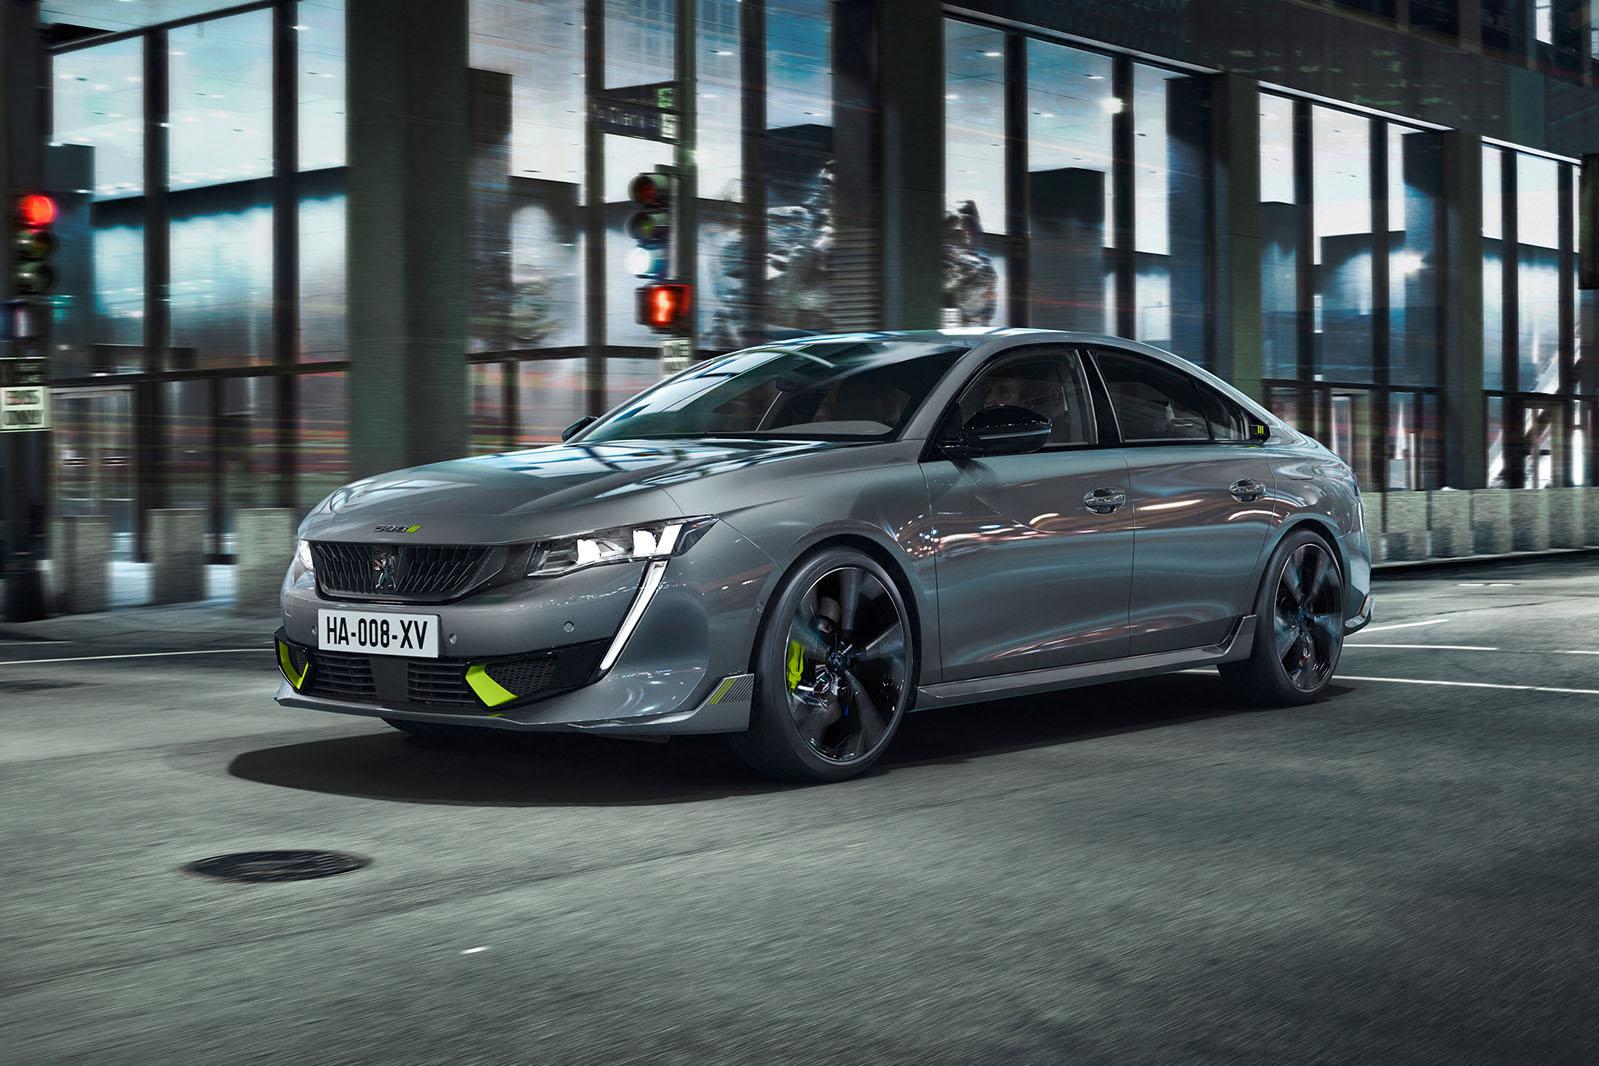 2021 Peugeot 508 PSE: 355bhp hot plug-in hybrid revealed - Autocar